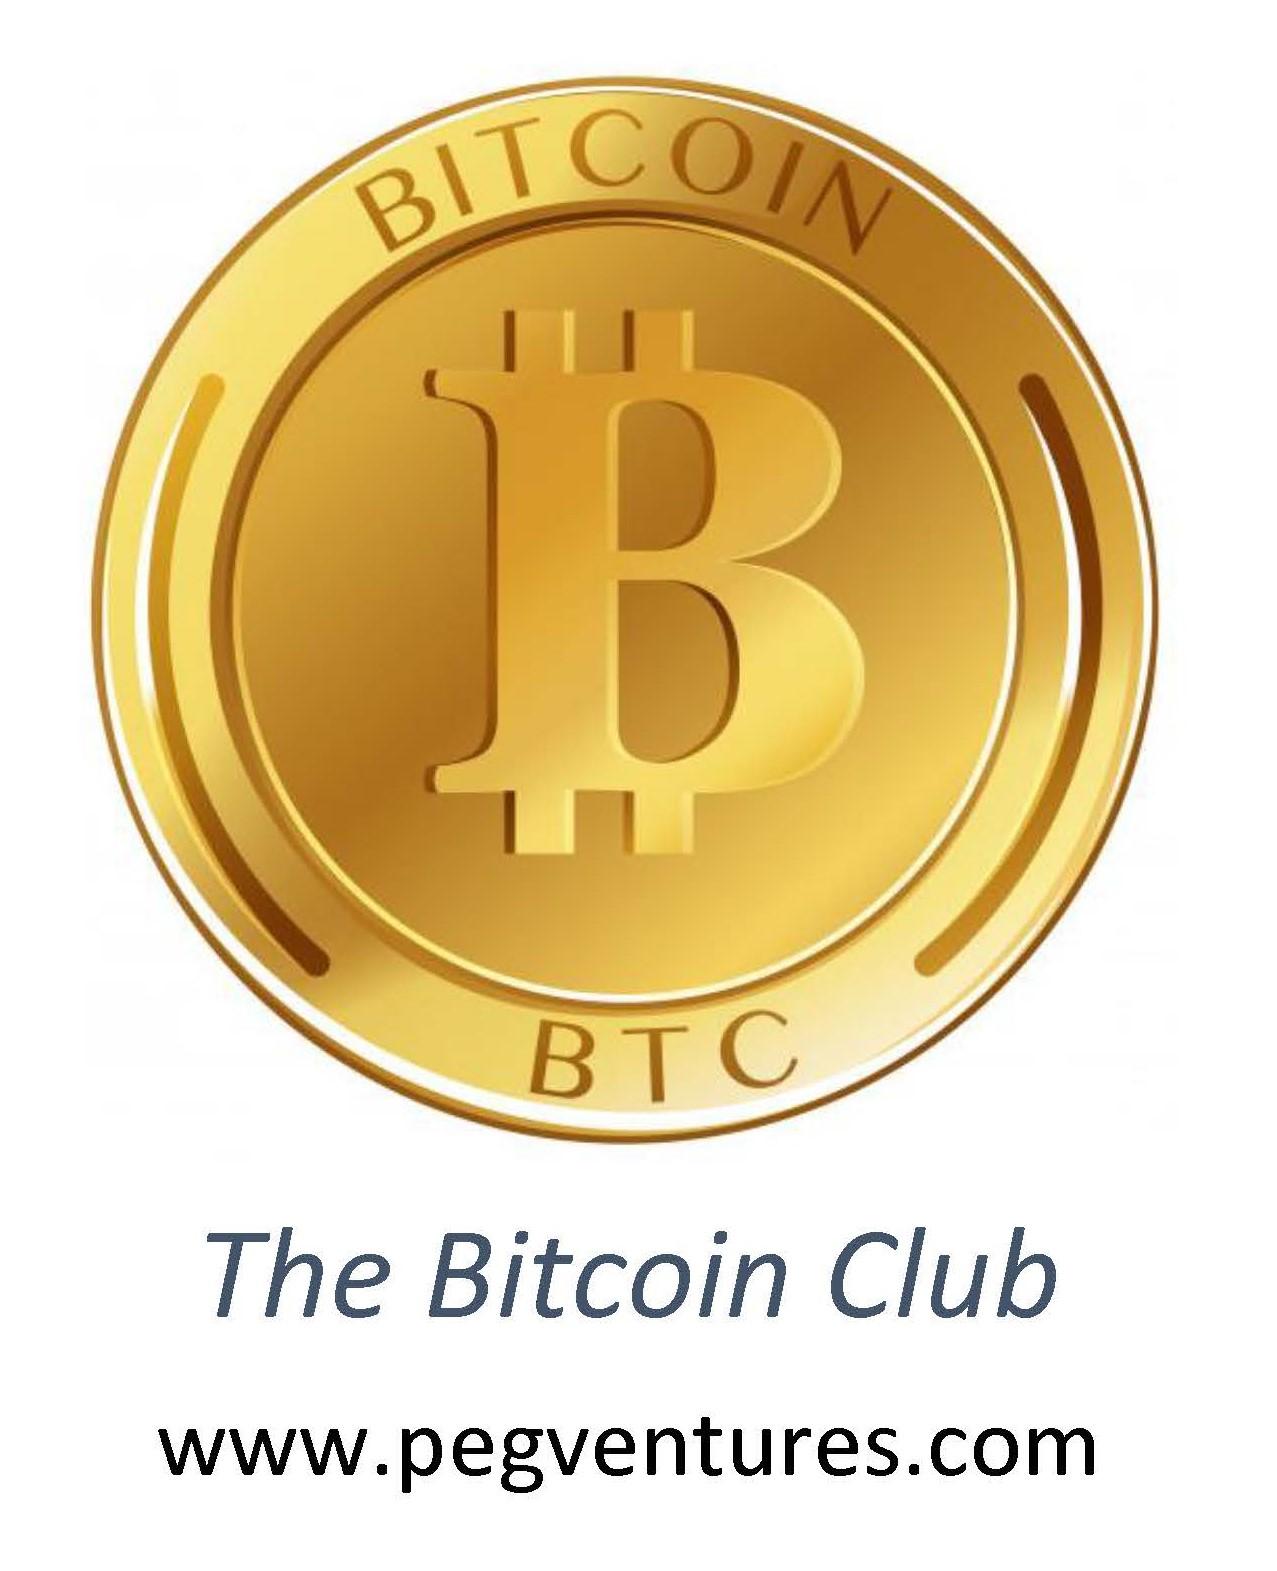 The Bitcoin Club